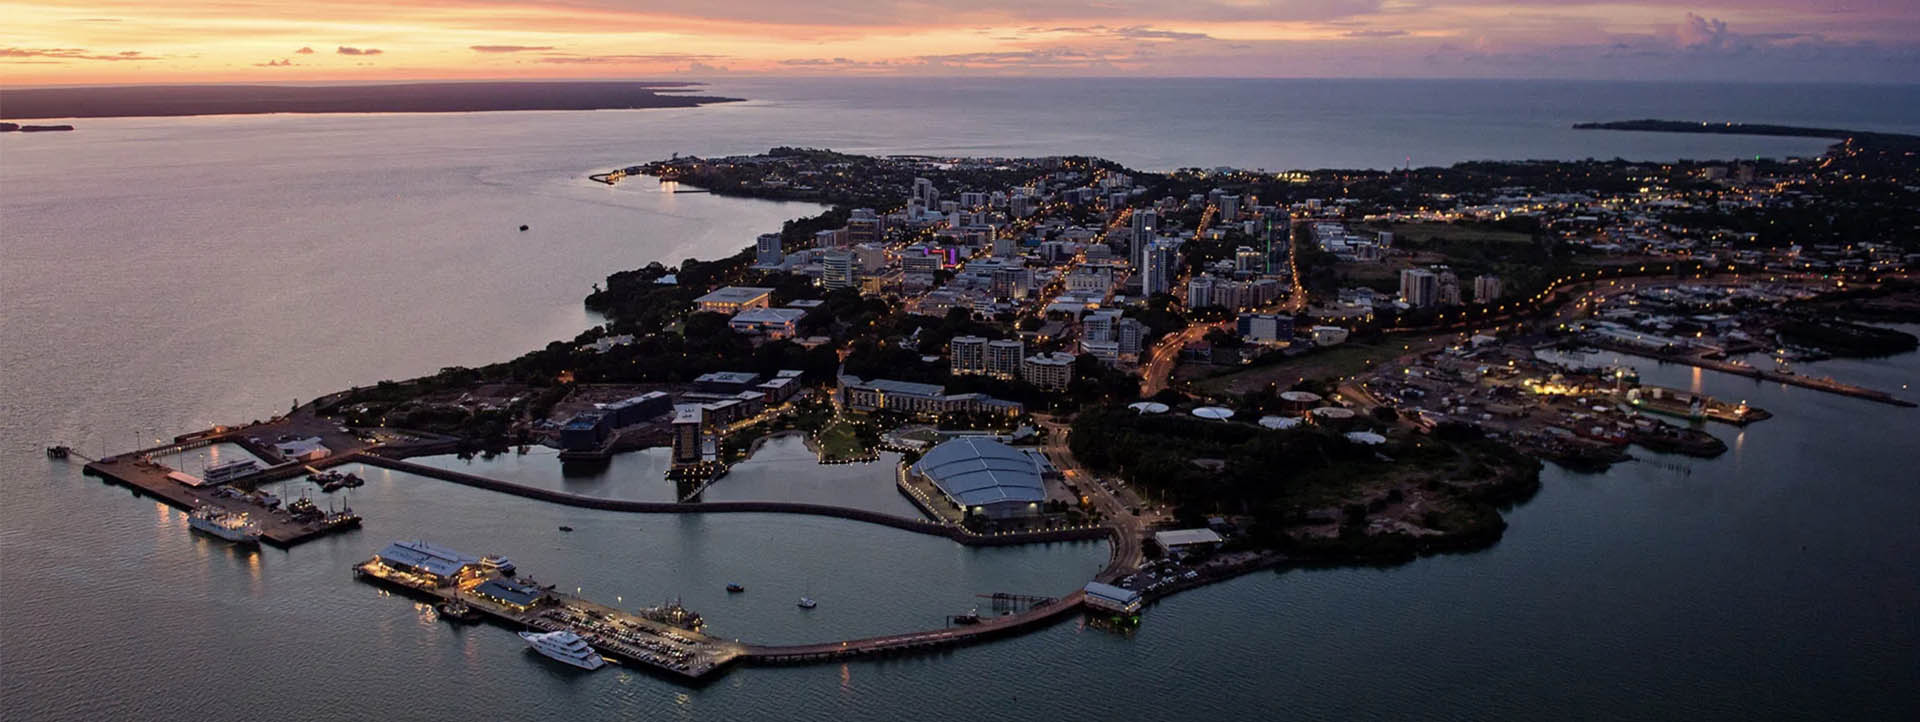 DARWIN TOURS city lights